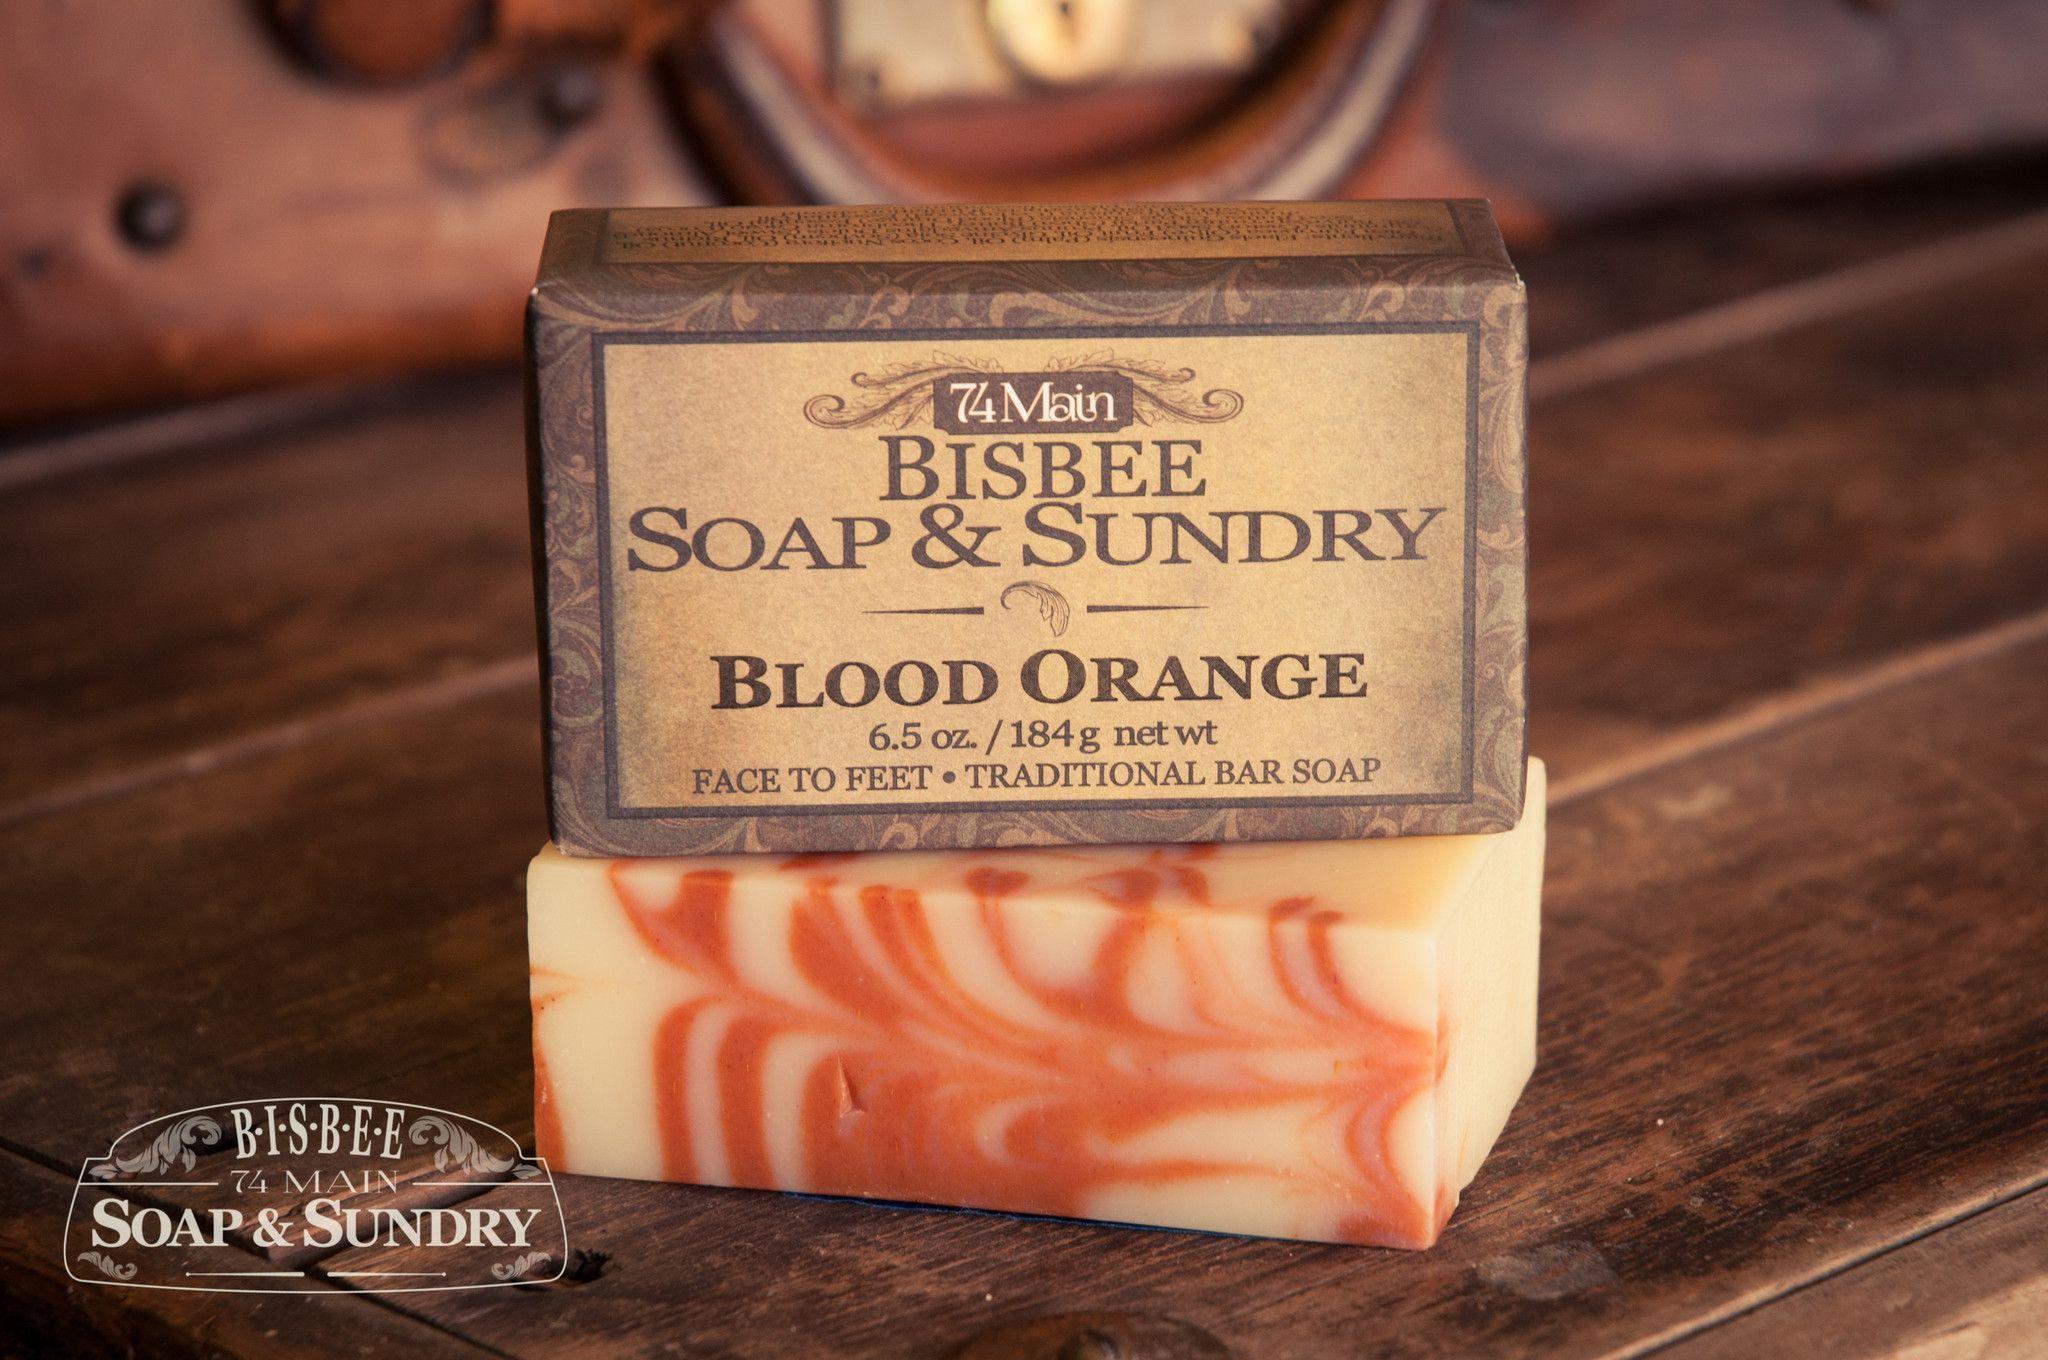 Blood Orange Soap - 6.5 oz